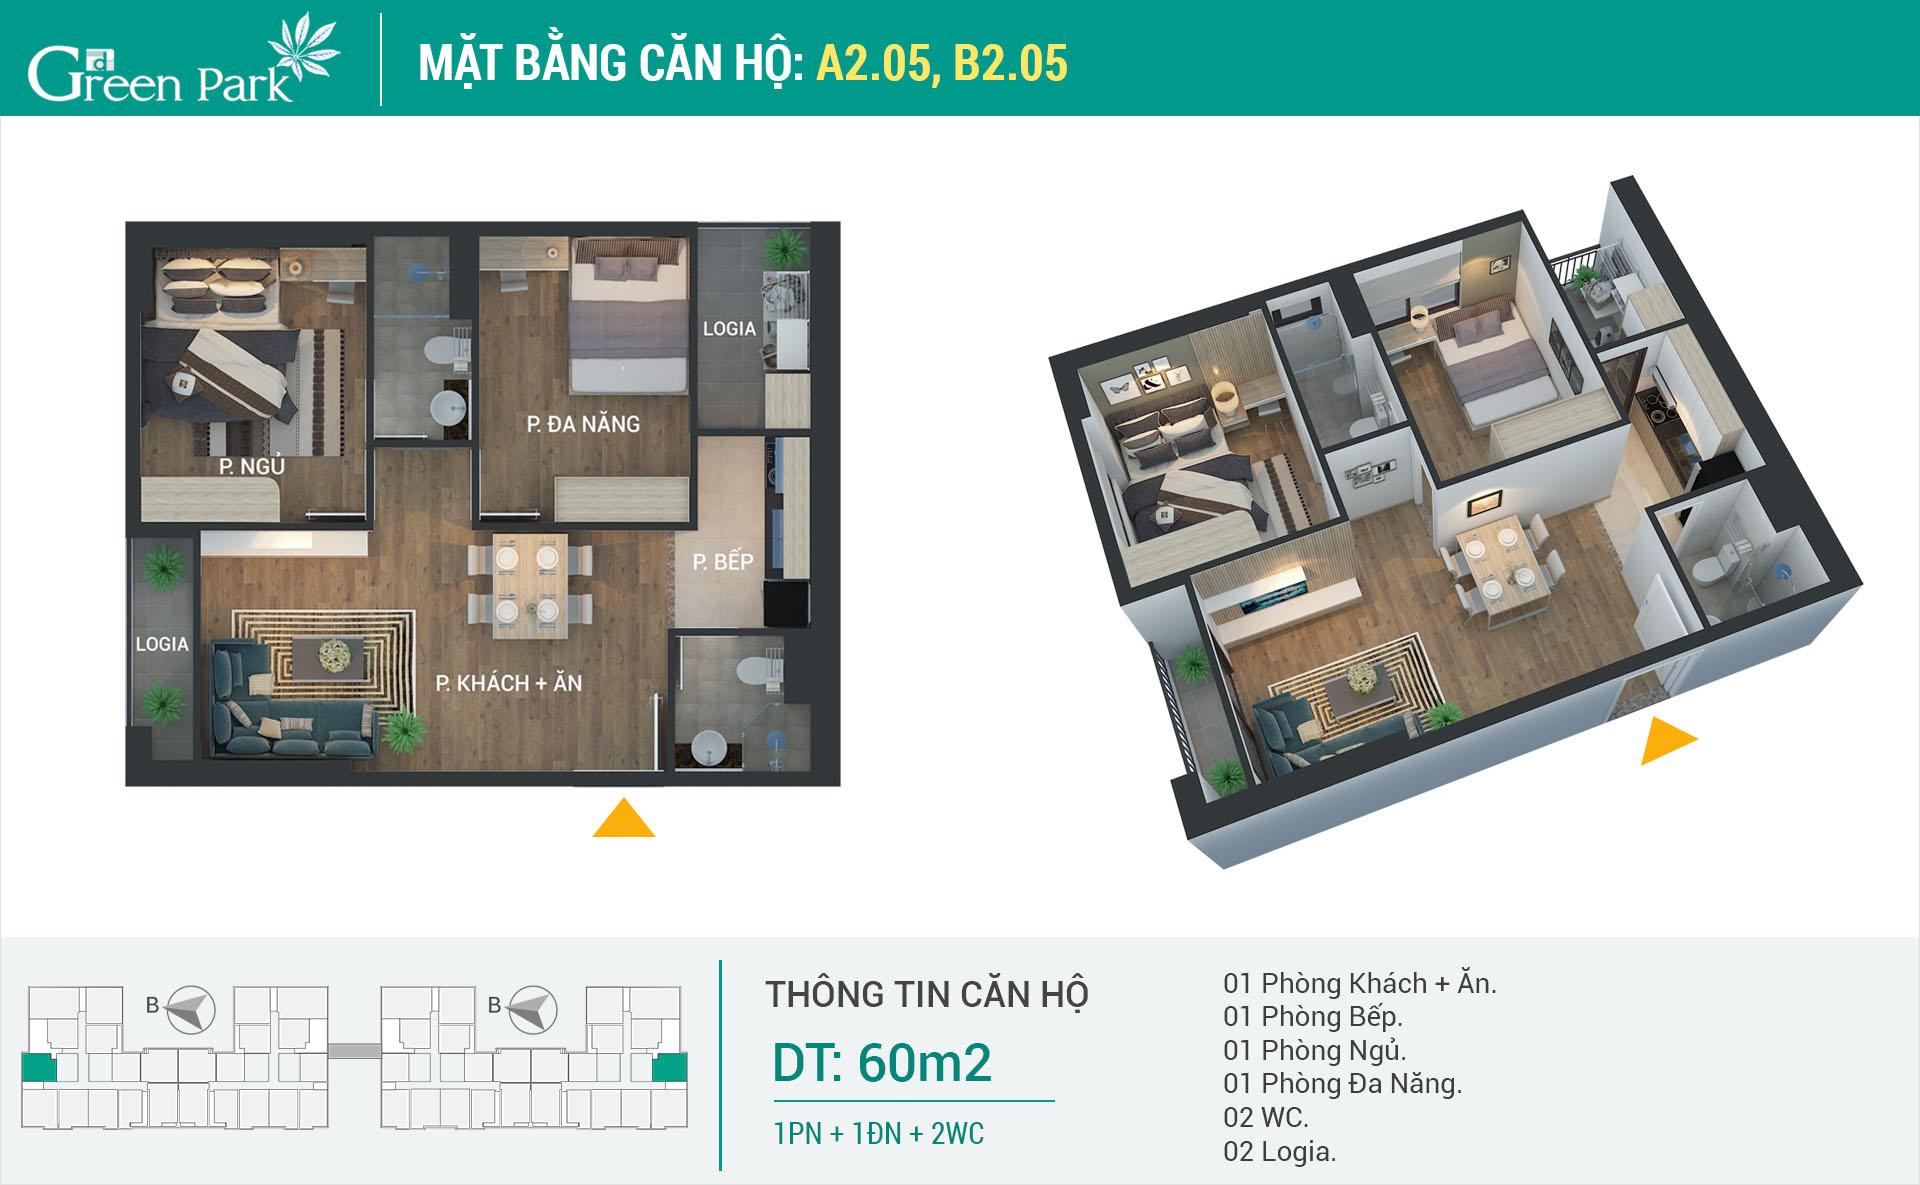 Mặt bằng căn hộ A2-05, B2-05